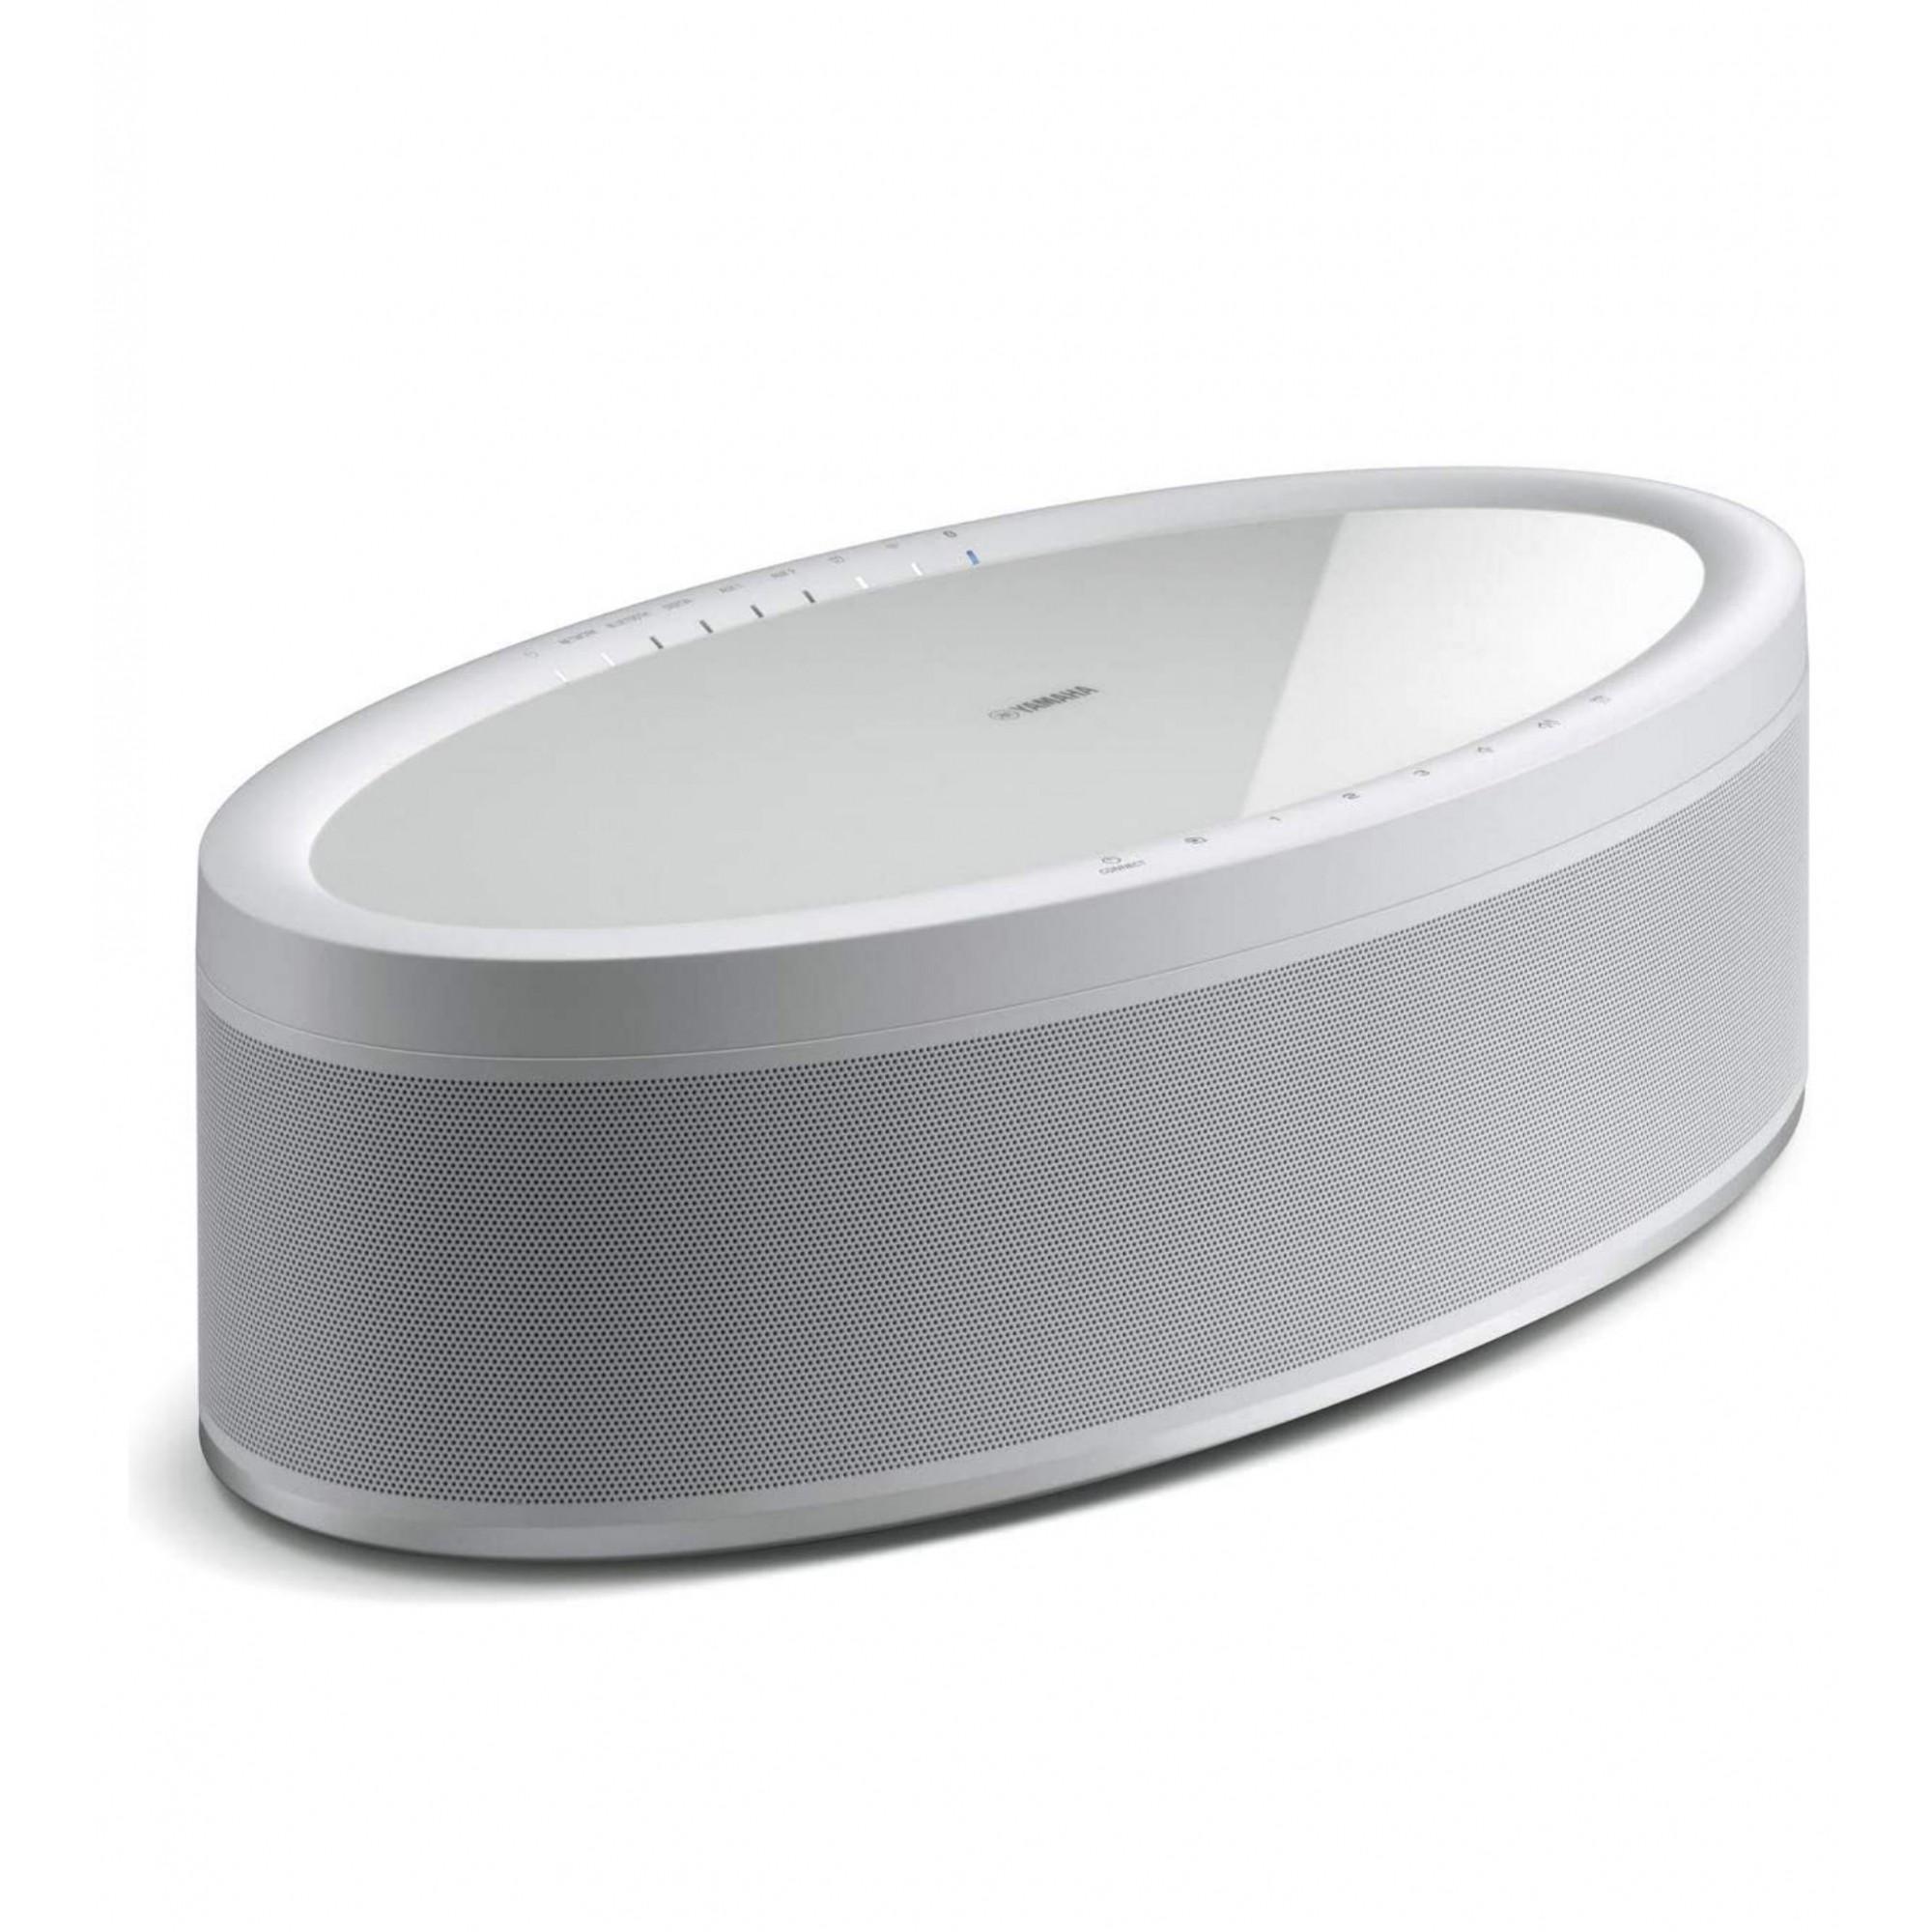 Yamaha Musiccast 50 Wx-051 Wireless Caixa som sem fio Branco